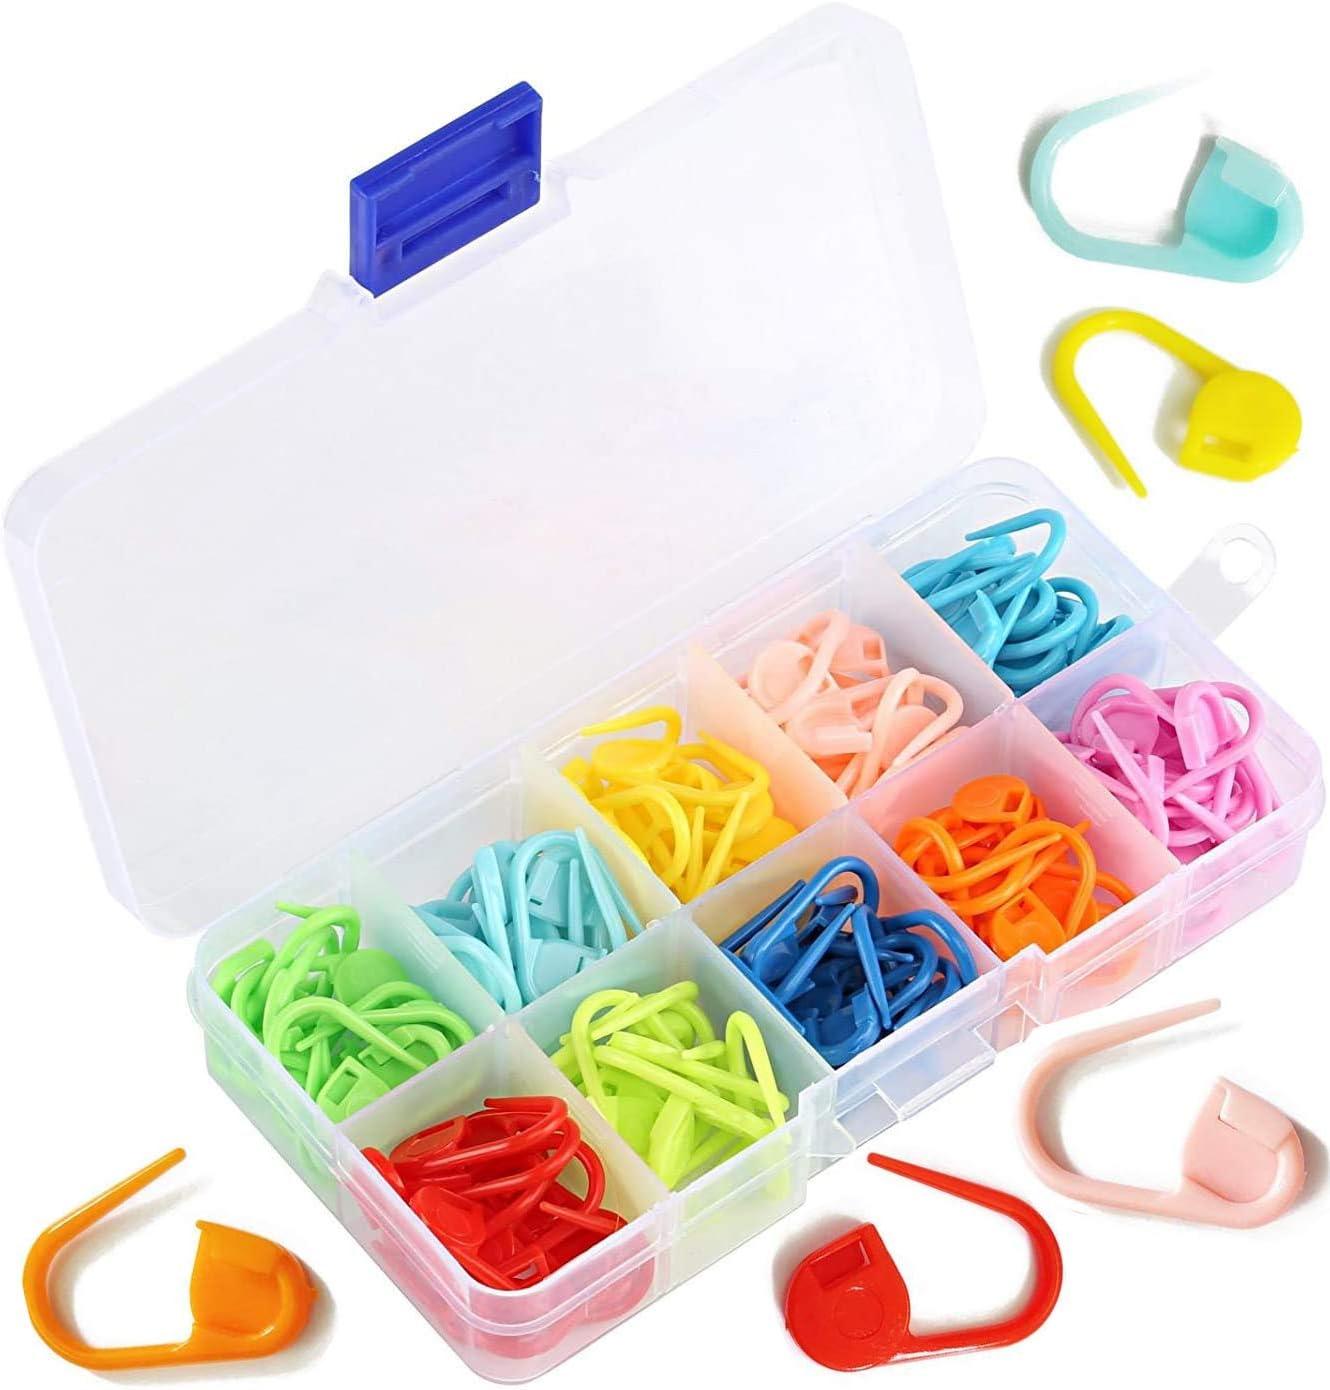 Kshcf Locking Stitch Markers 100 PCS Colorful Multipurpose Stitch Needle Clip,Pack of 100